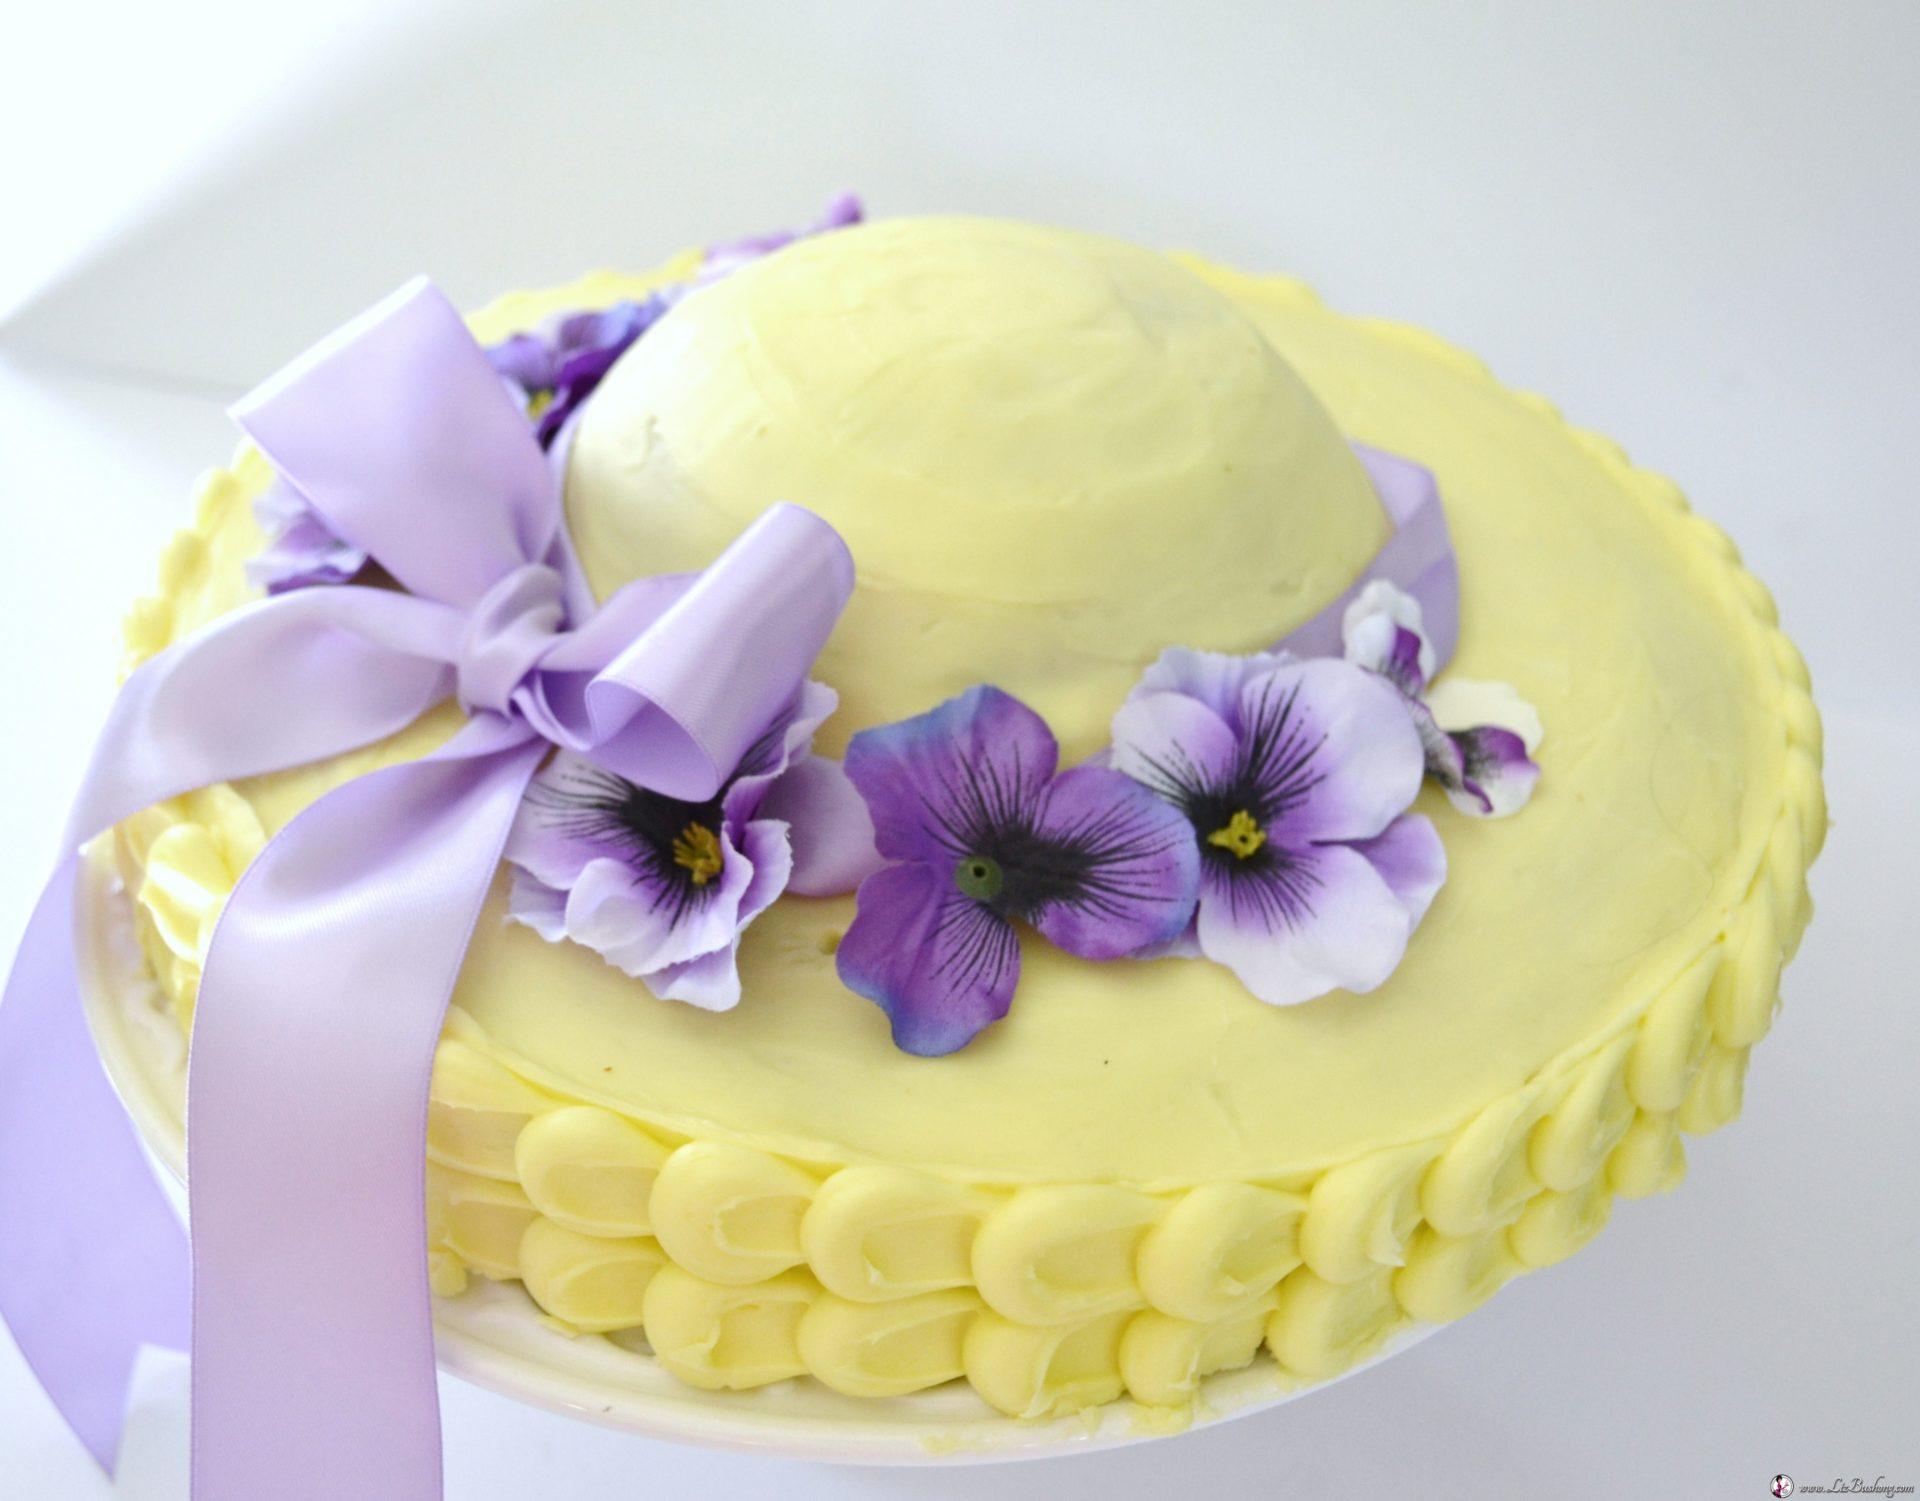 http://lizbushong.wpengine.com/wp-content/uploads/2017/04/Easter-Cake-Hat-Lizbushong.com_.jpg